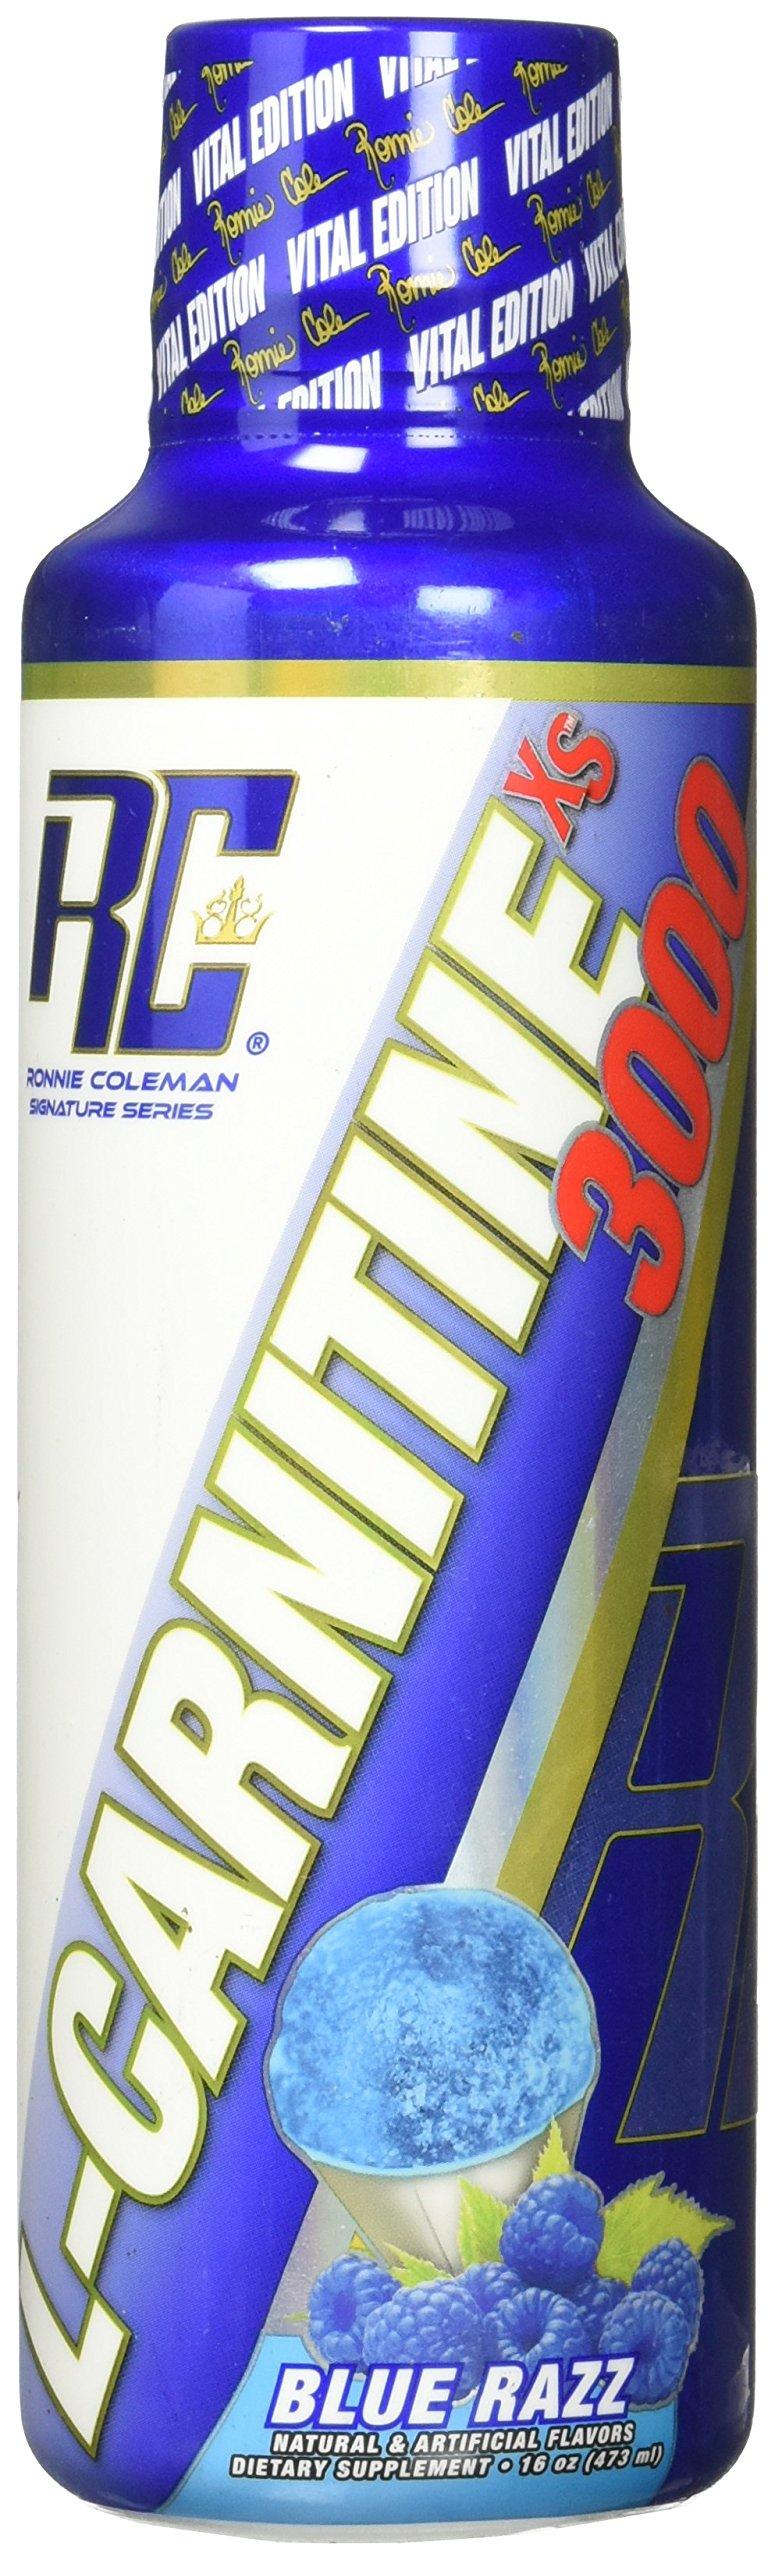 Ronnie Coleman Signature Series L-Carnitine XS Dietary Supplement, Blue Raspberry, 16 Fluid Ounce